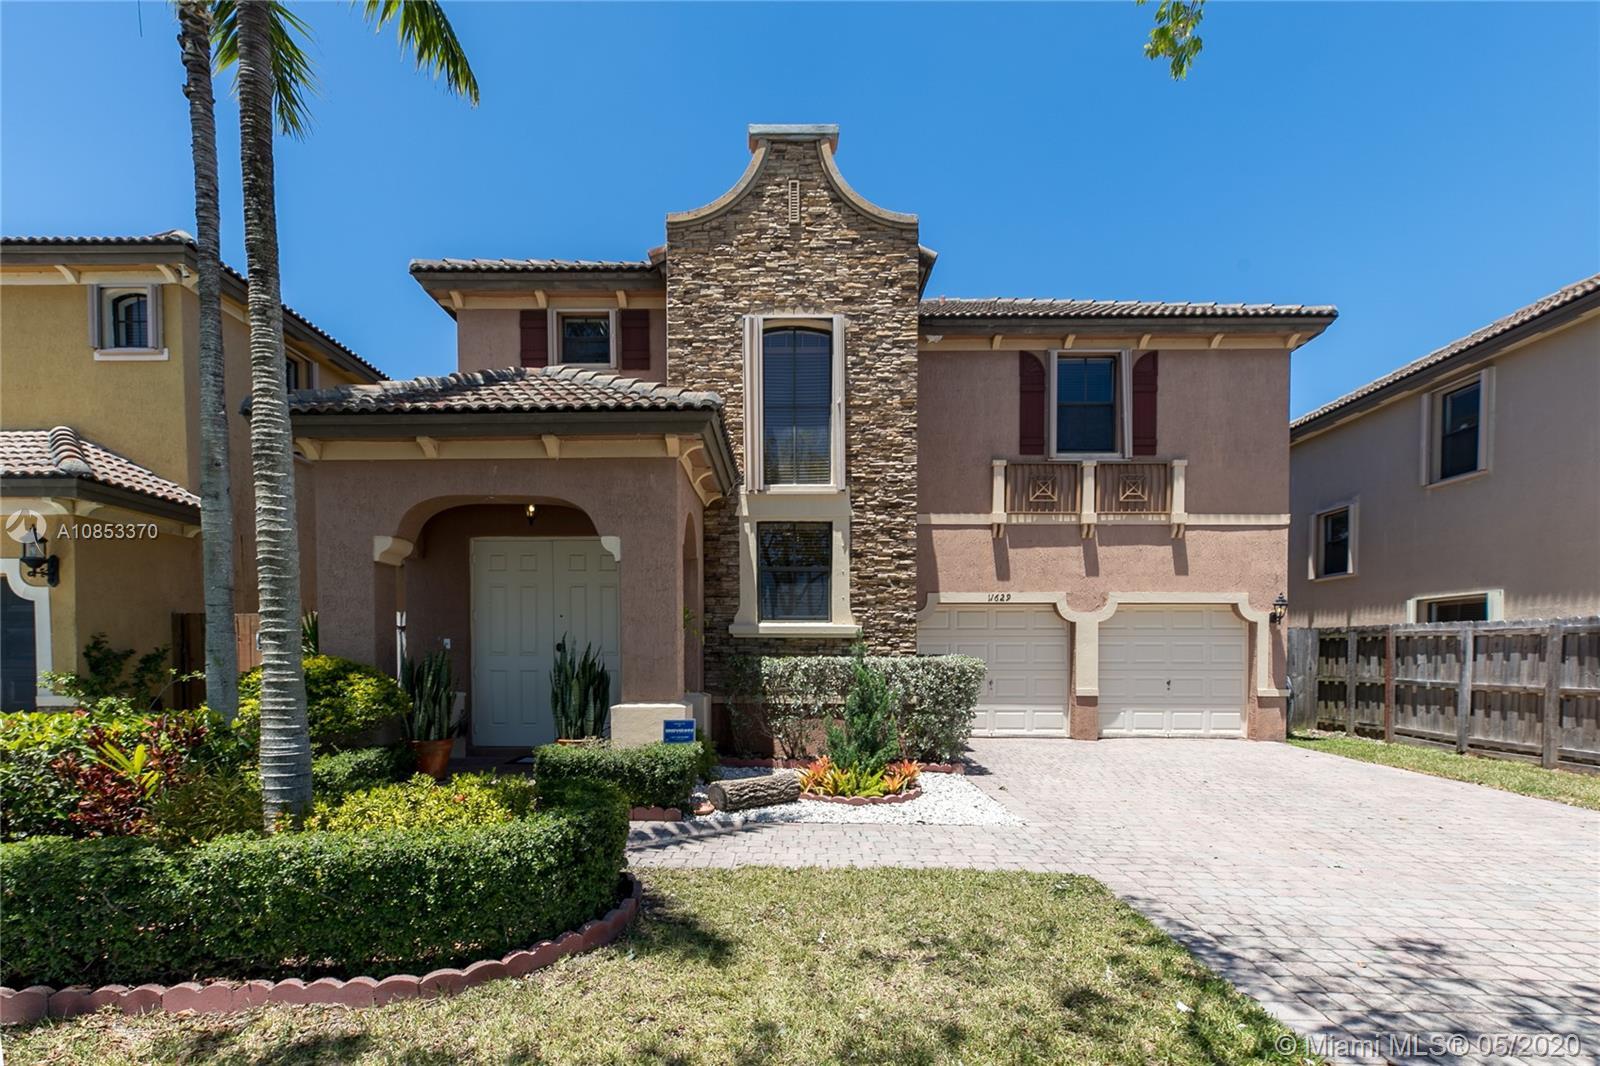 11629 SW 236th St, Homestead, FL 33032 - Homestead, FL real estate listing